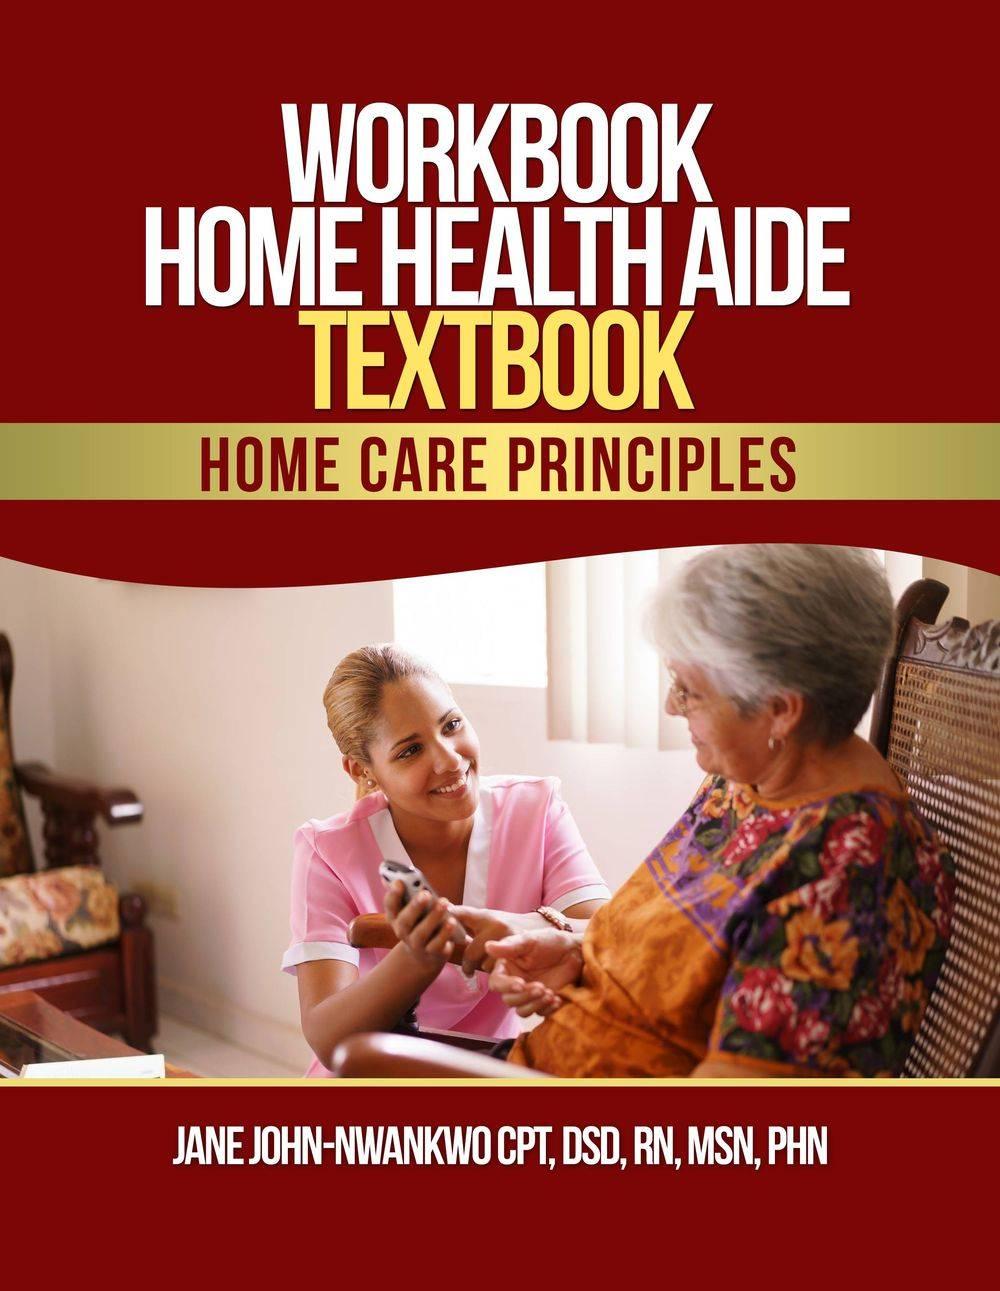 home care book